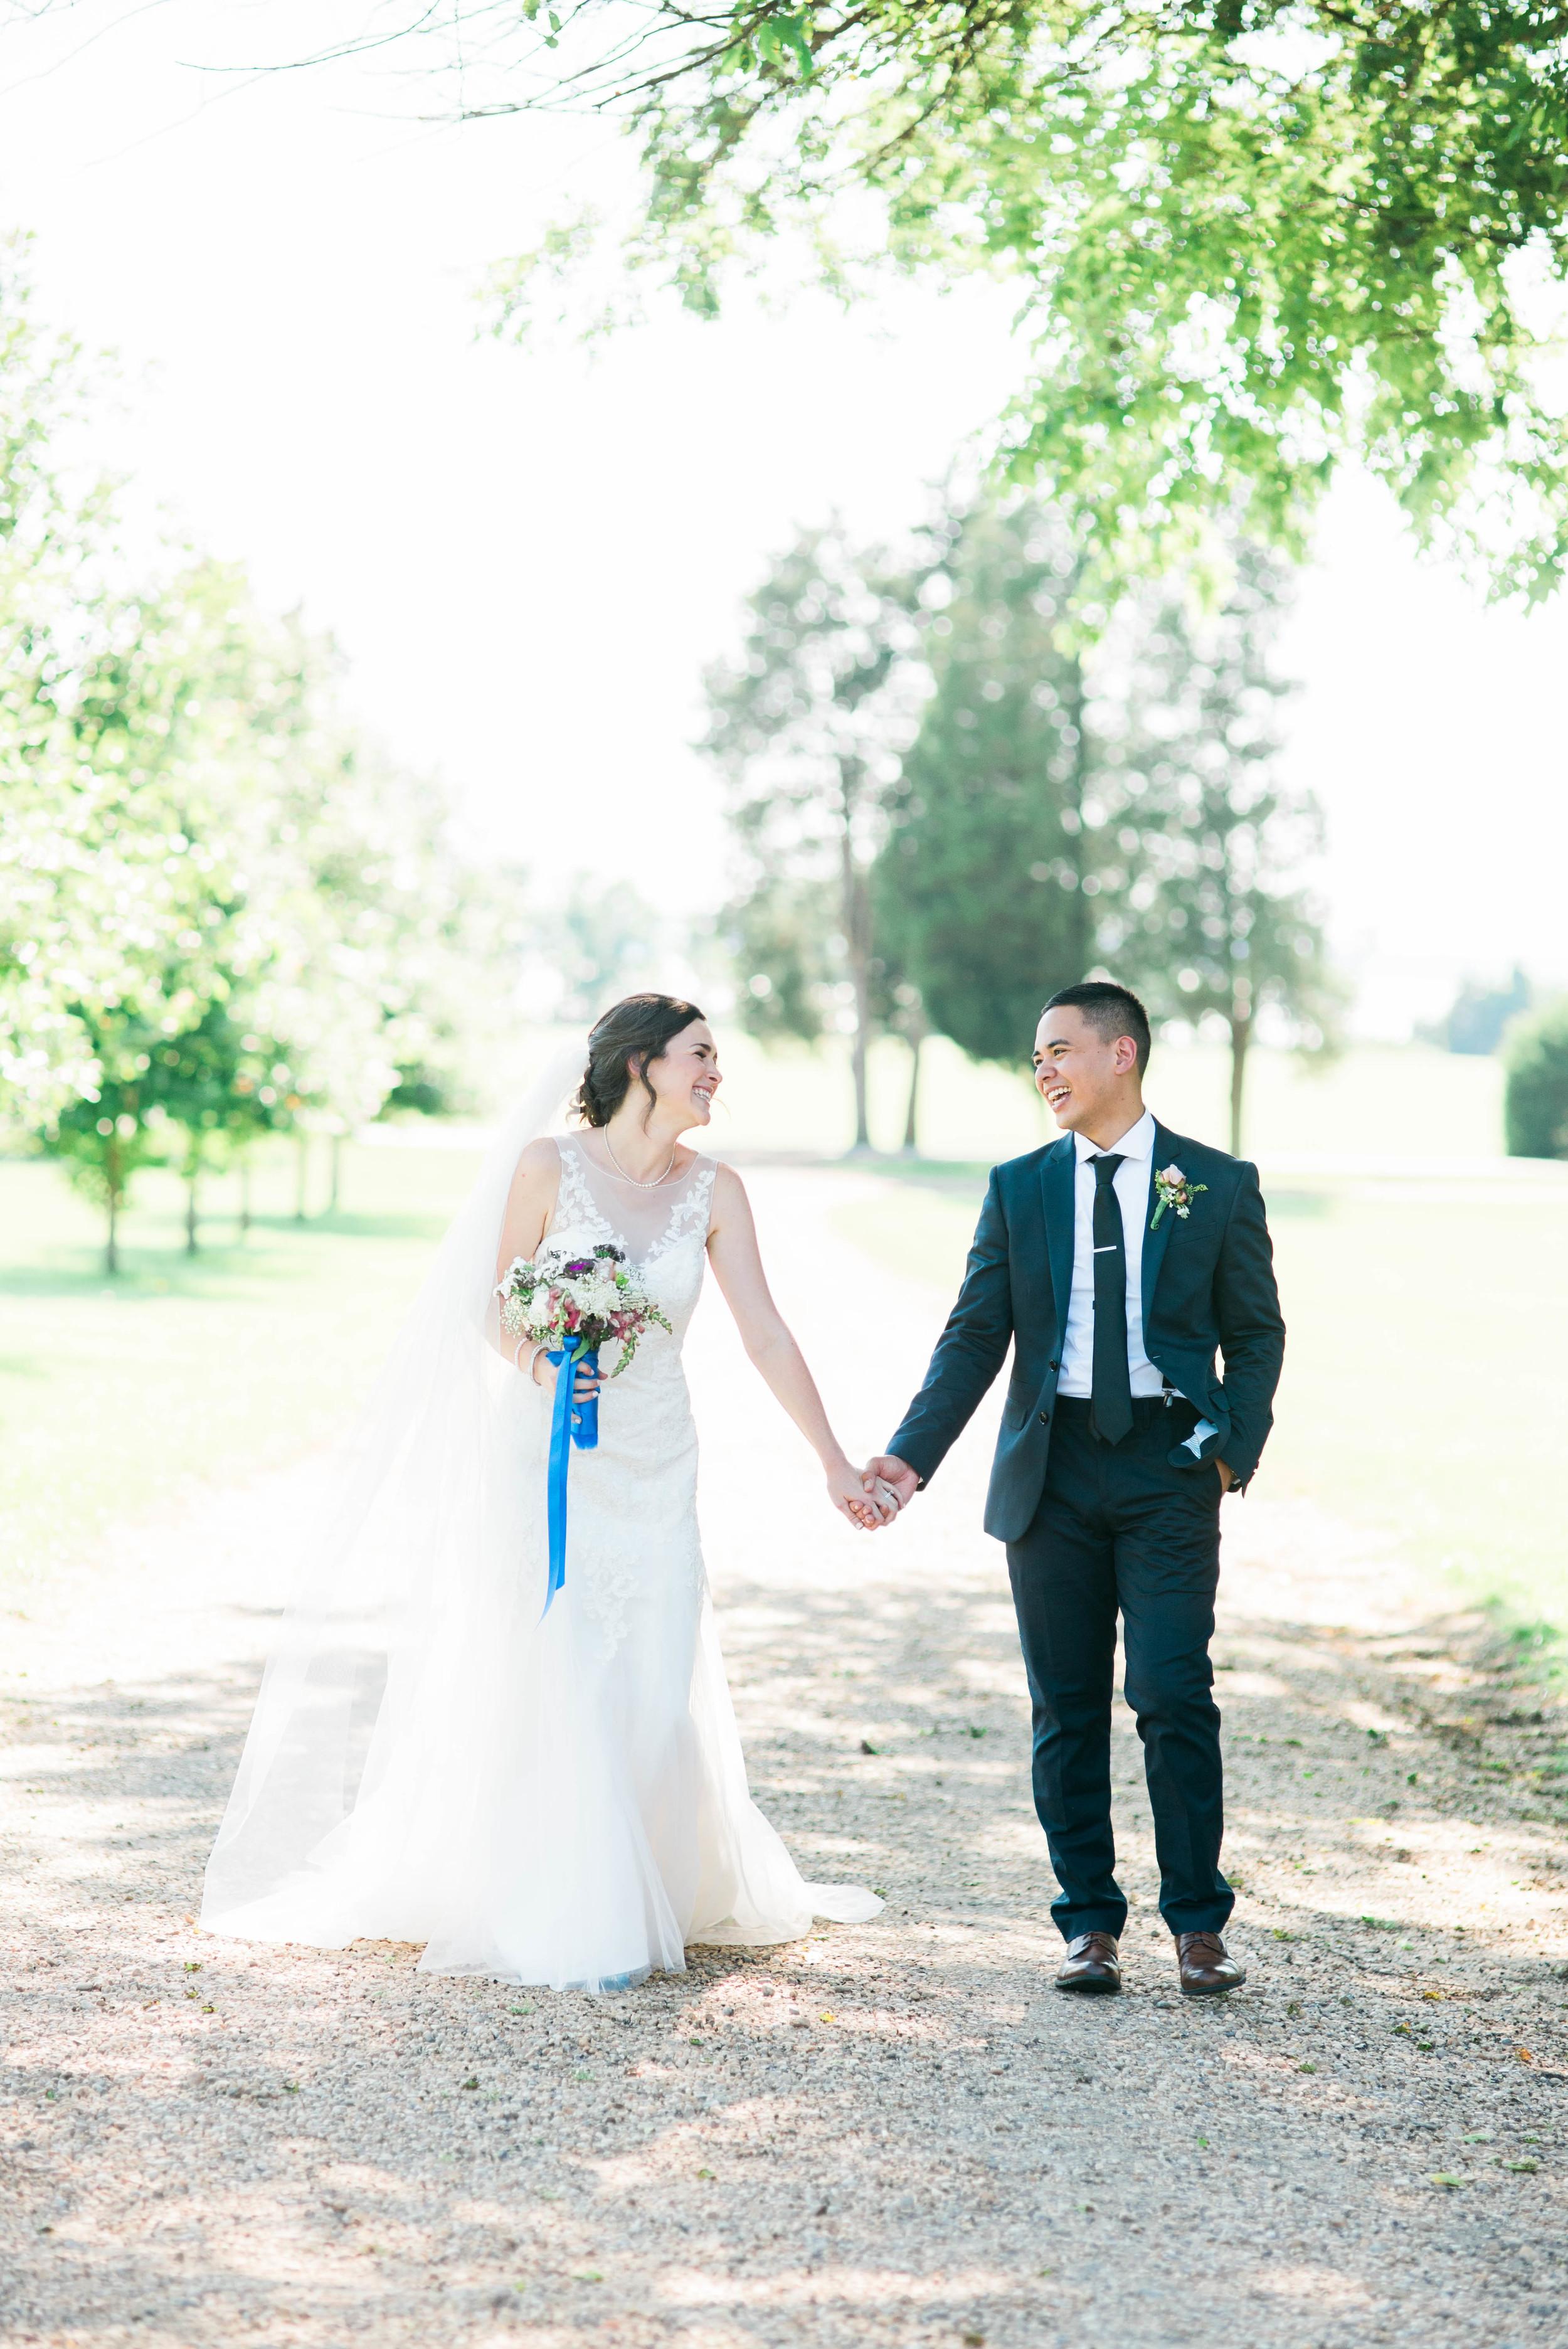 PREVIEWremowedding2016-40.jpg